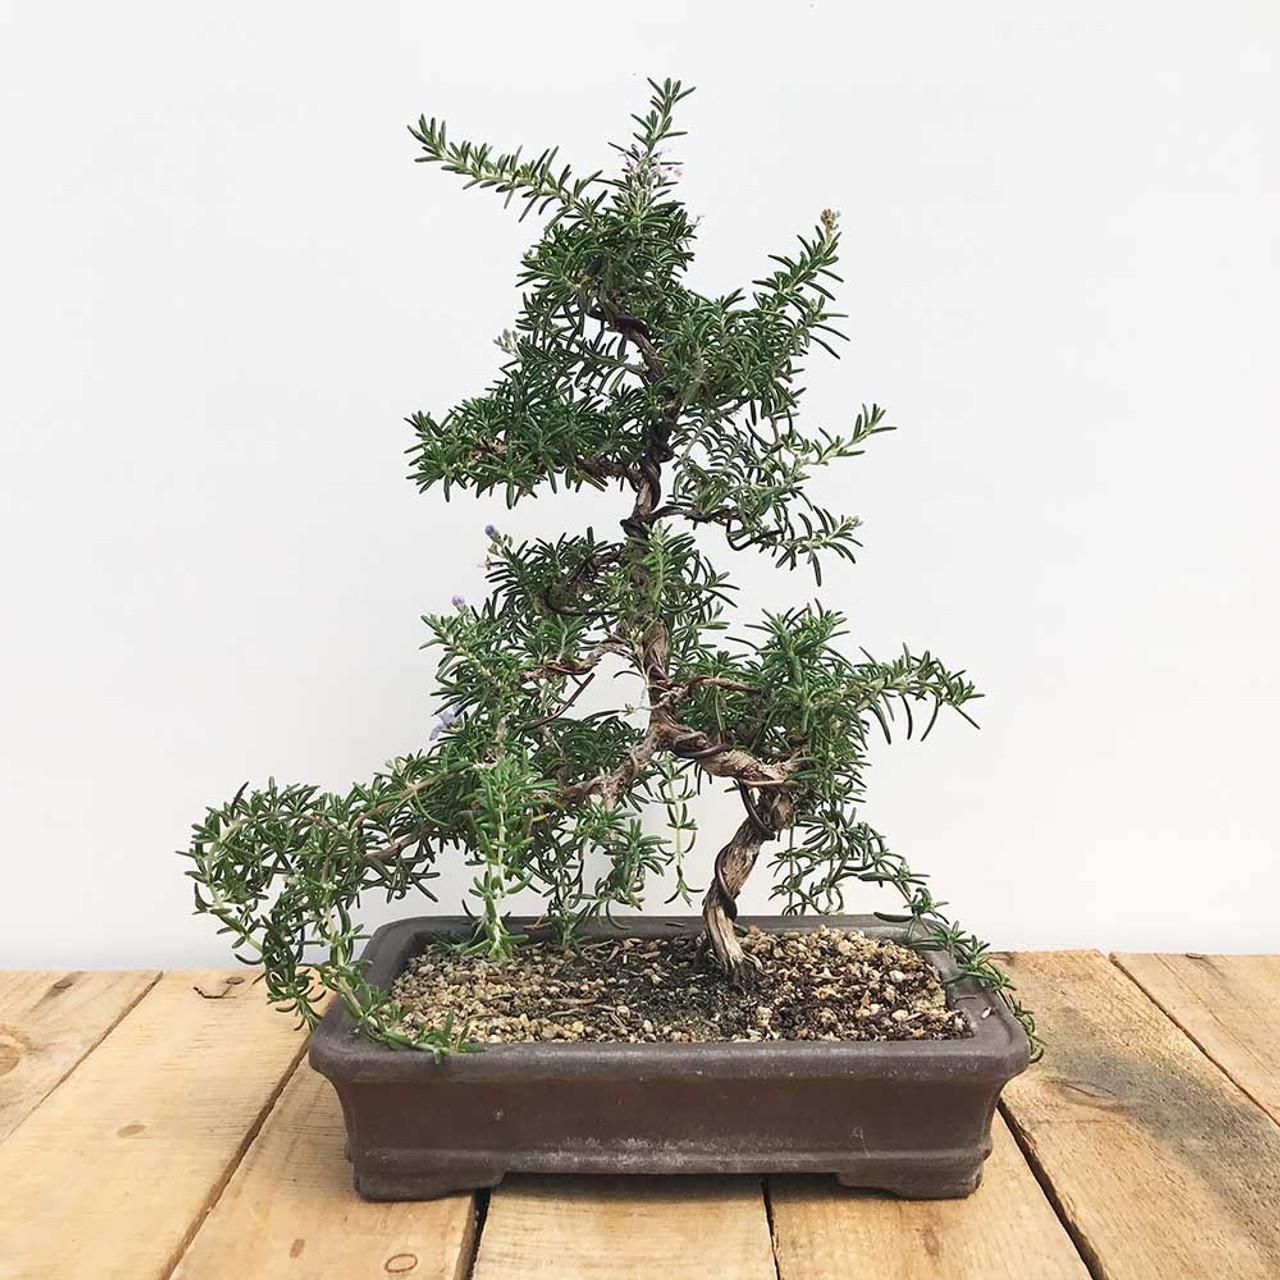 Single Trunk Rosemary Bonsai Tree Bonsai Outlet